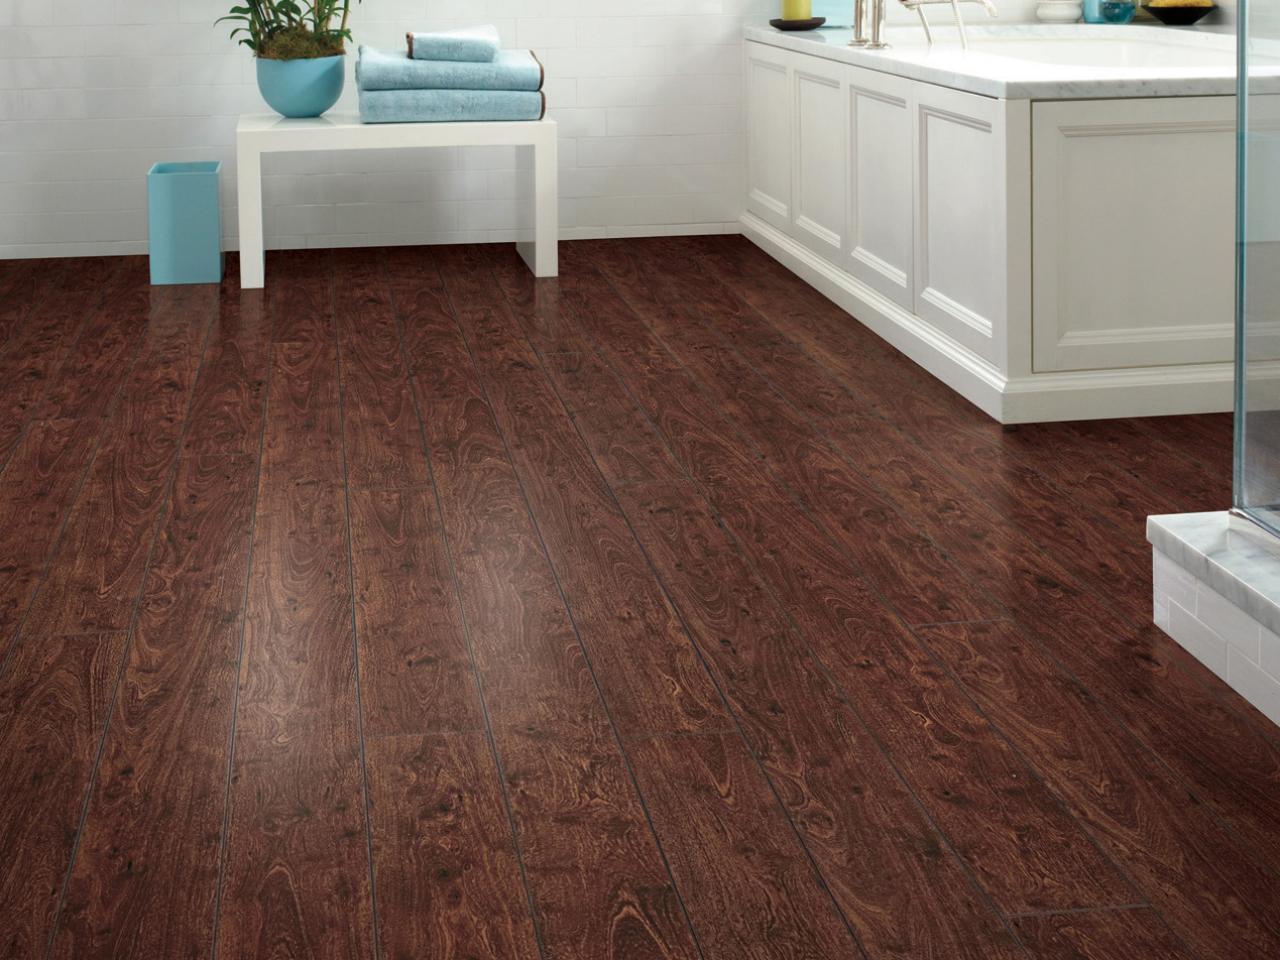 Laminate flooring ideas laminate flooring for basements MEQXRLB